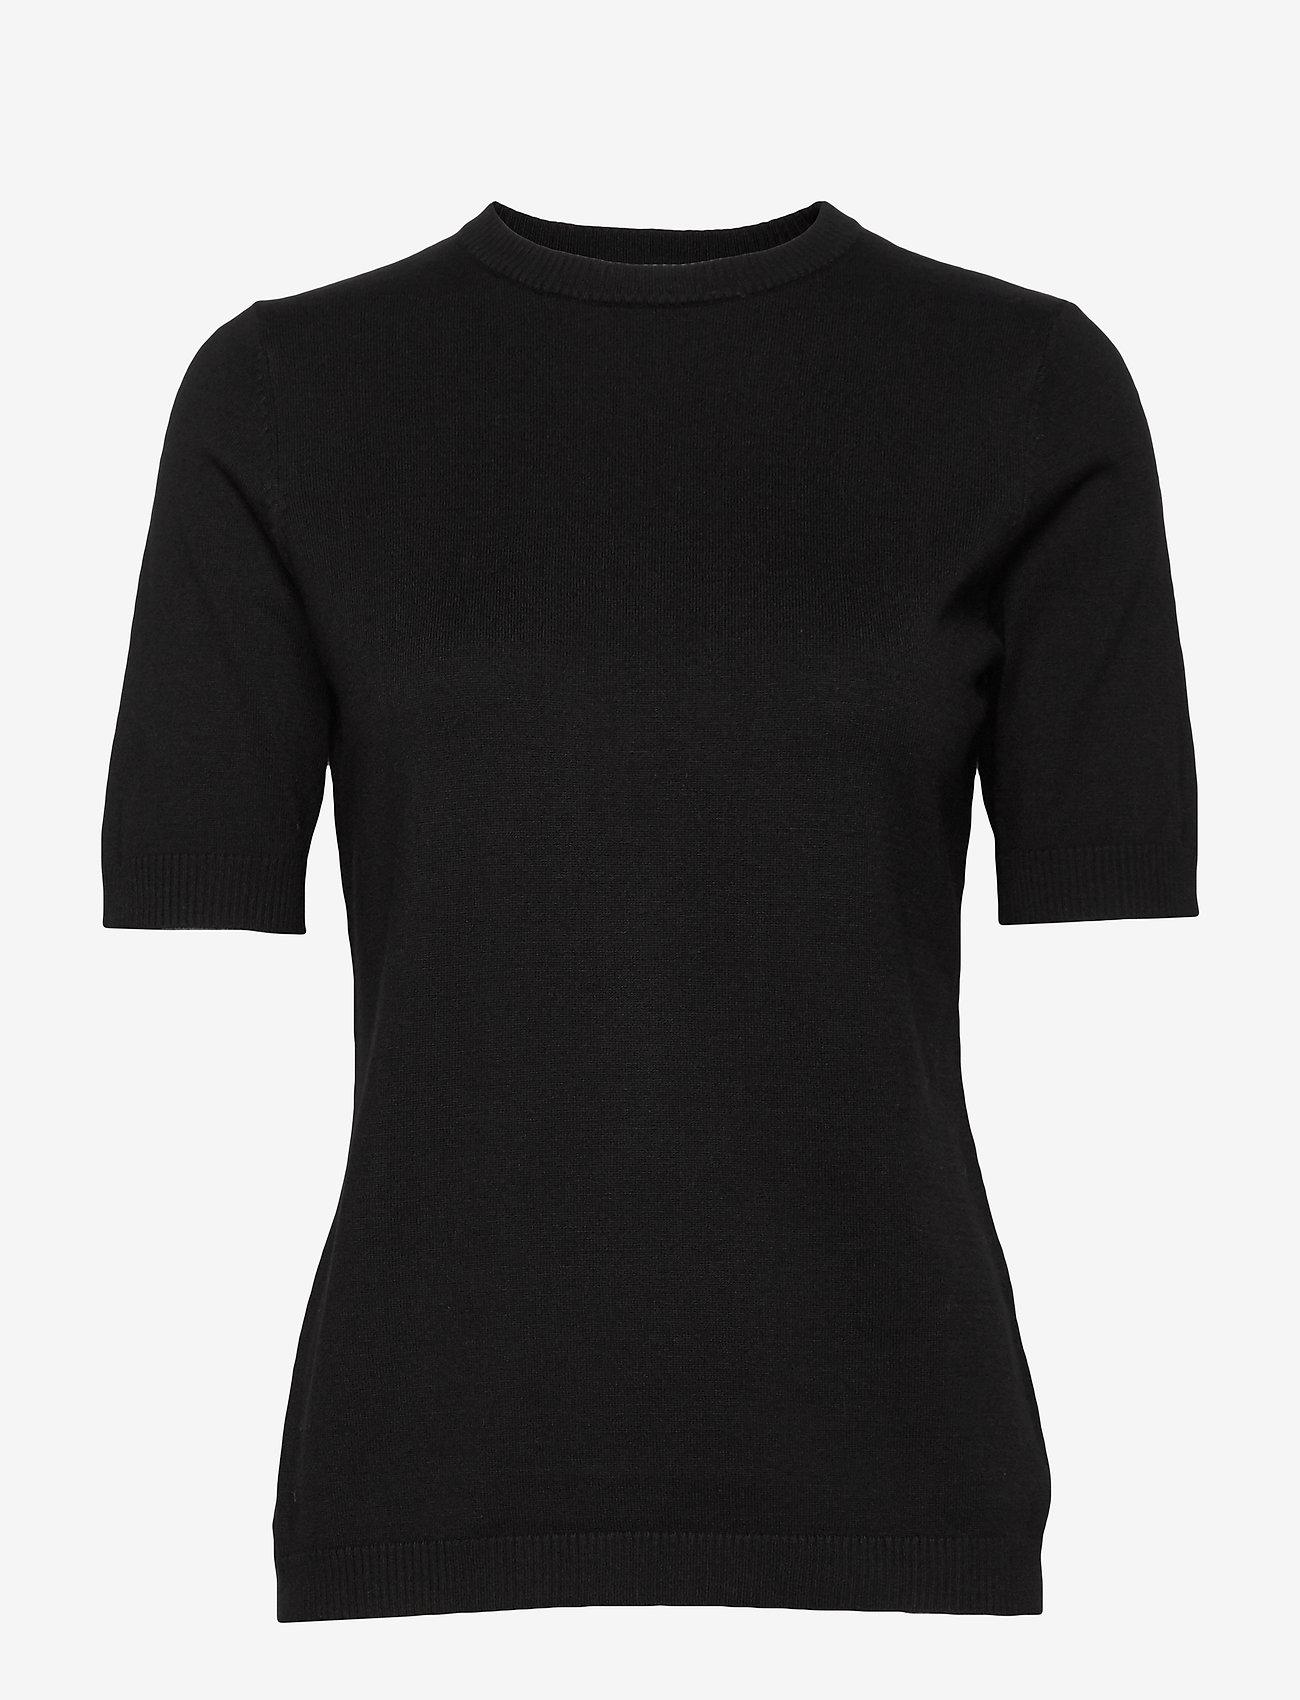 Minus - Pamela knit tee - gebreide t-shirts - sort - 0